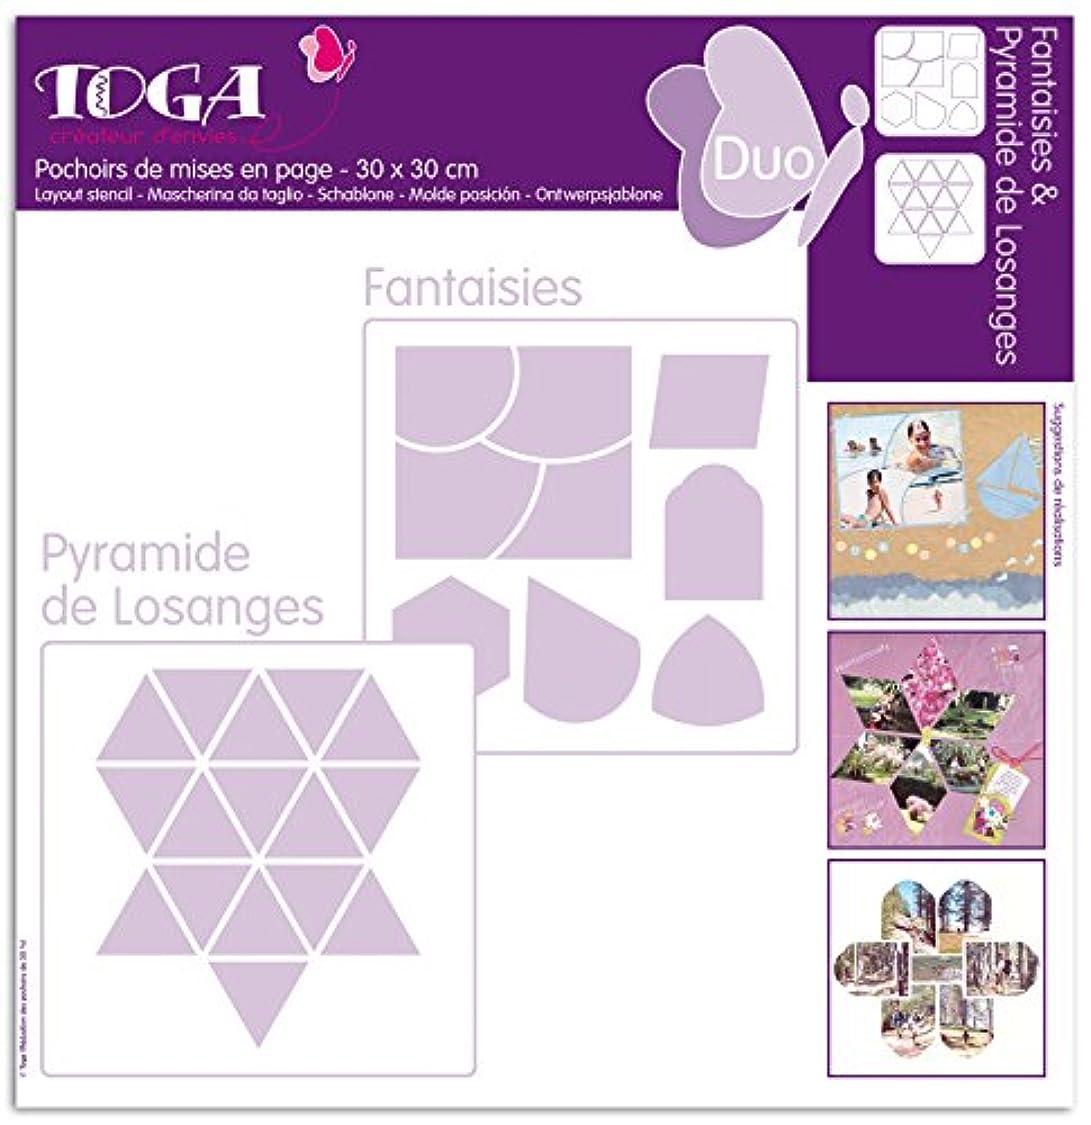 Toga PO19?Stencils Set of 2?30?x 30?x 0.1?cm Plastic Transparent ud16041377287323